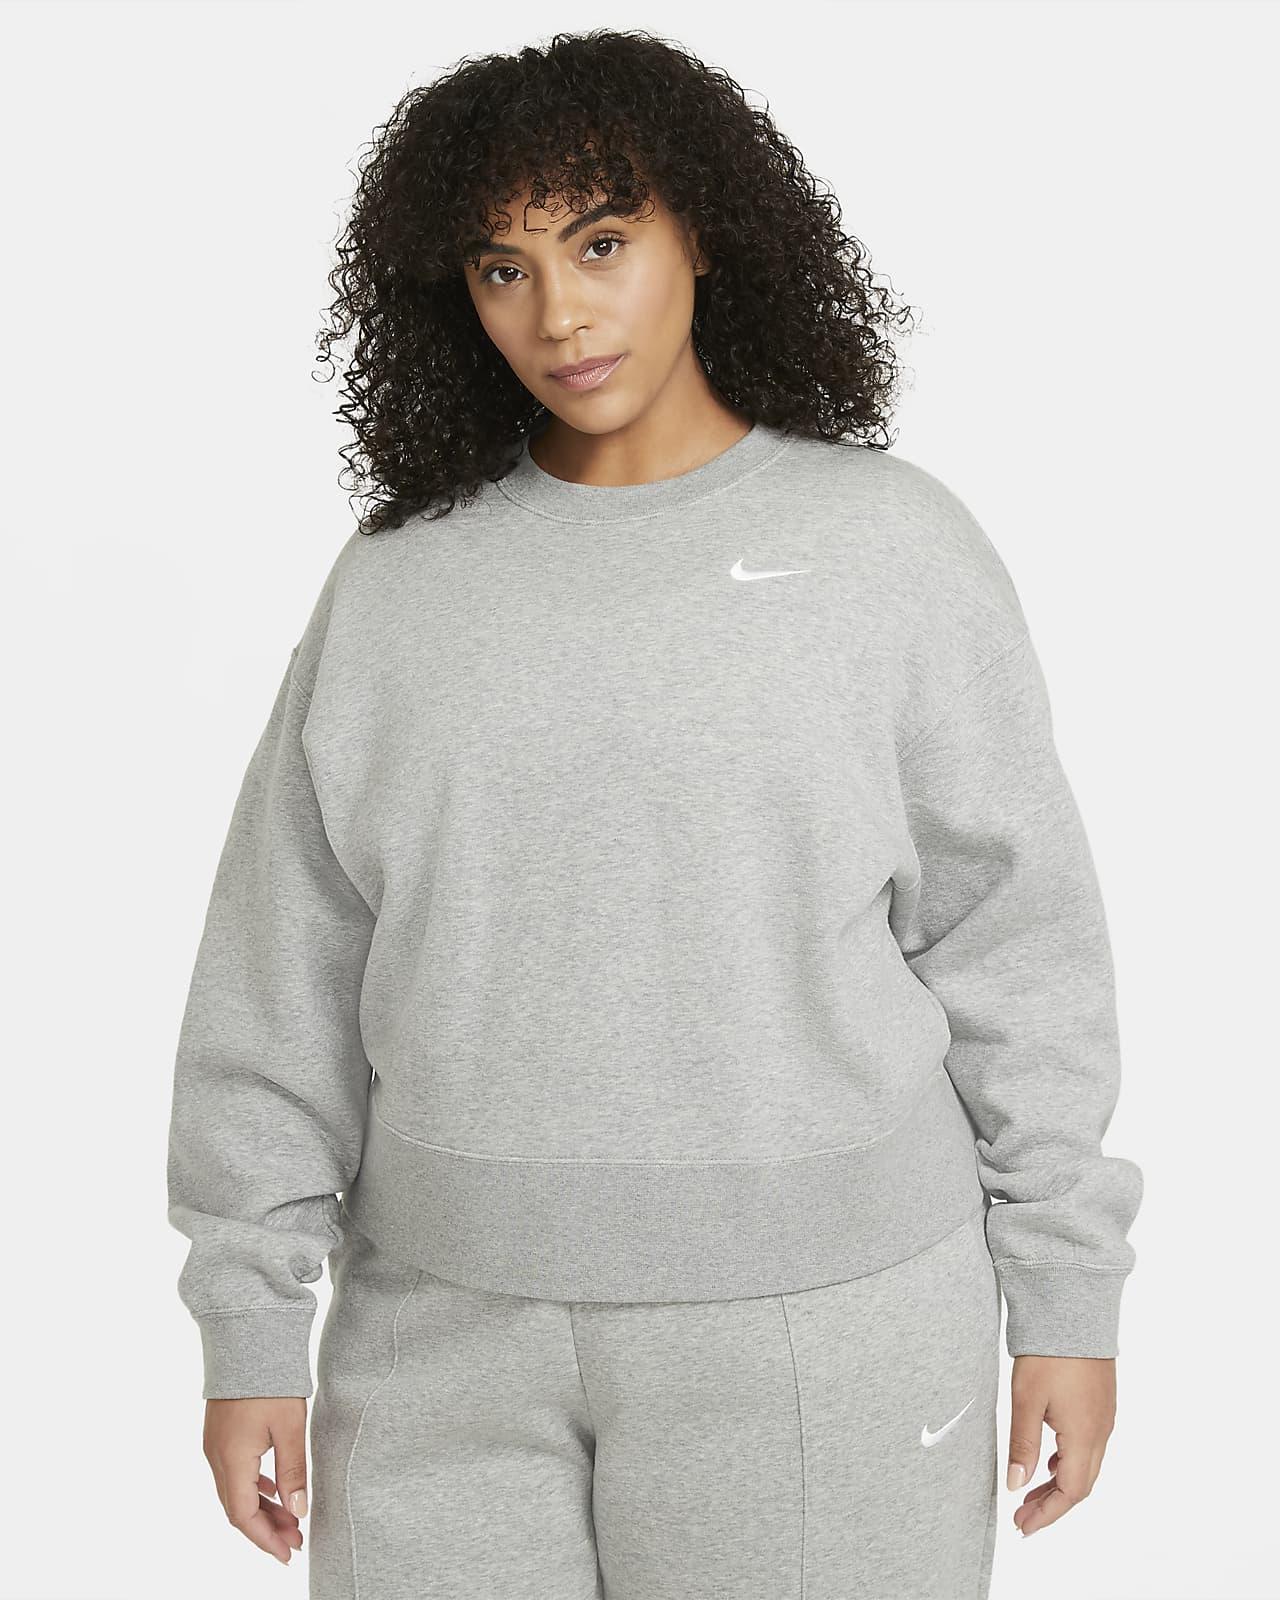 Sudadera para mujer (talla grande) Nike Sportswear Essential